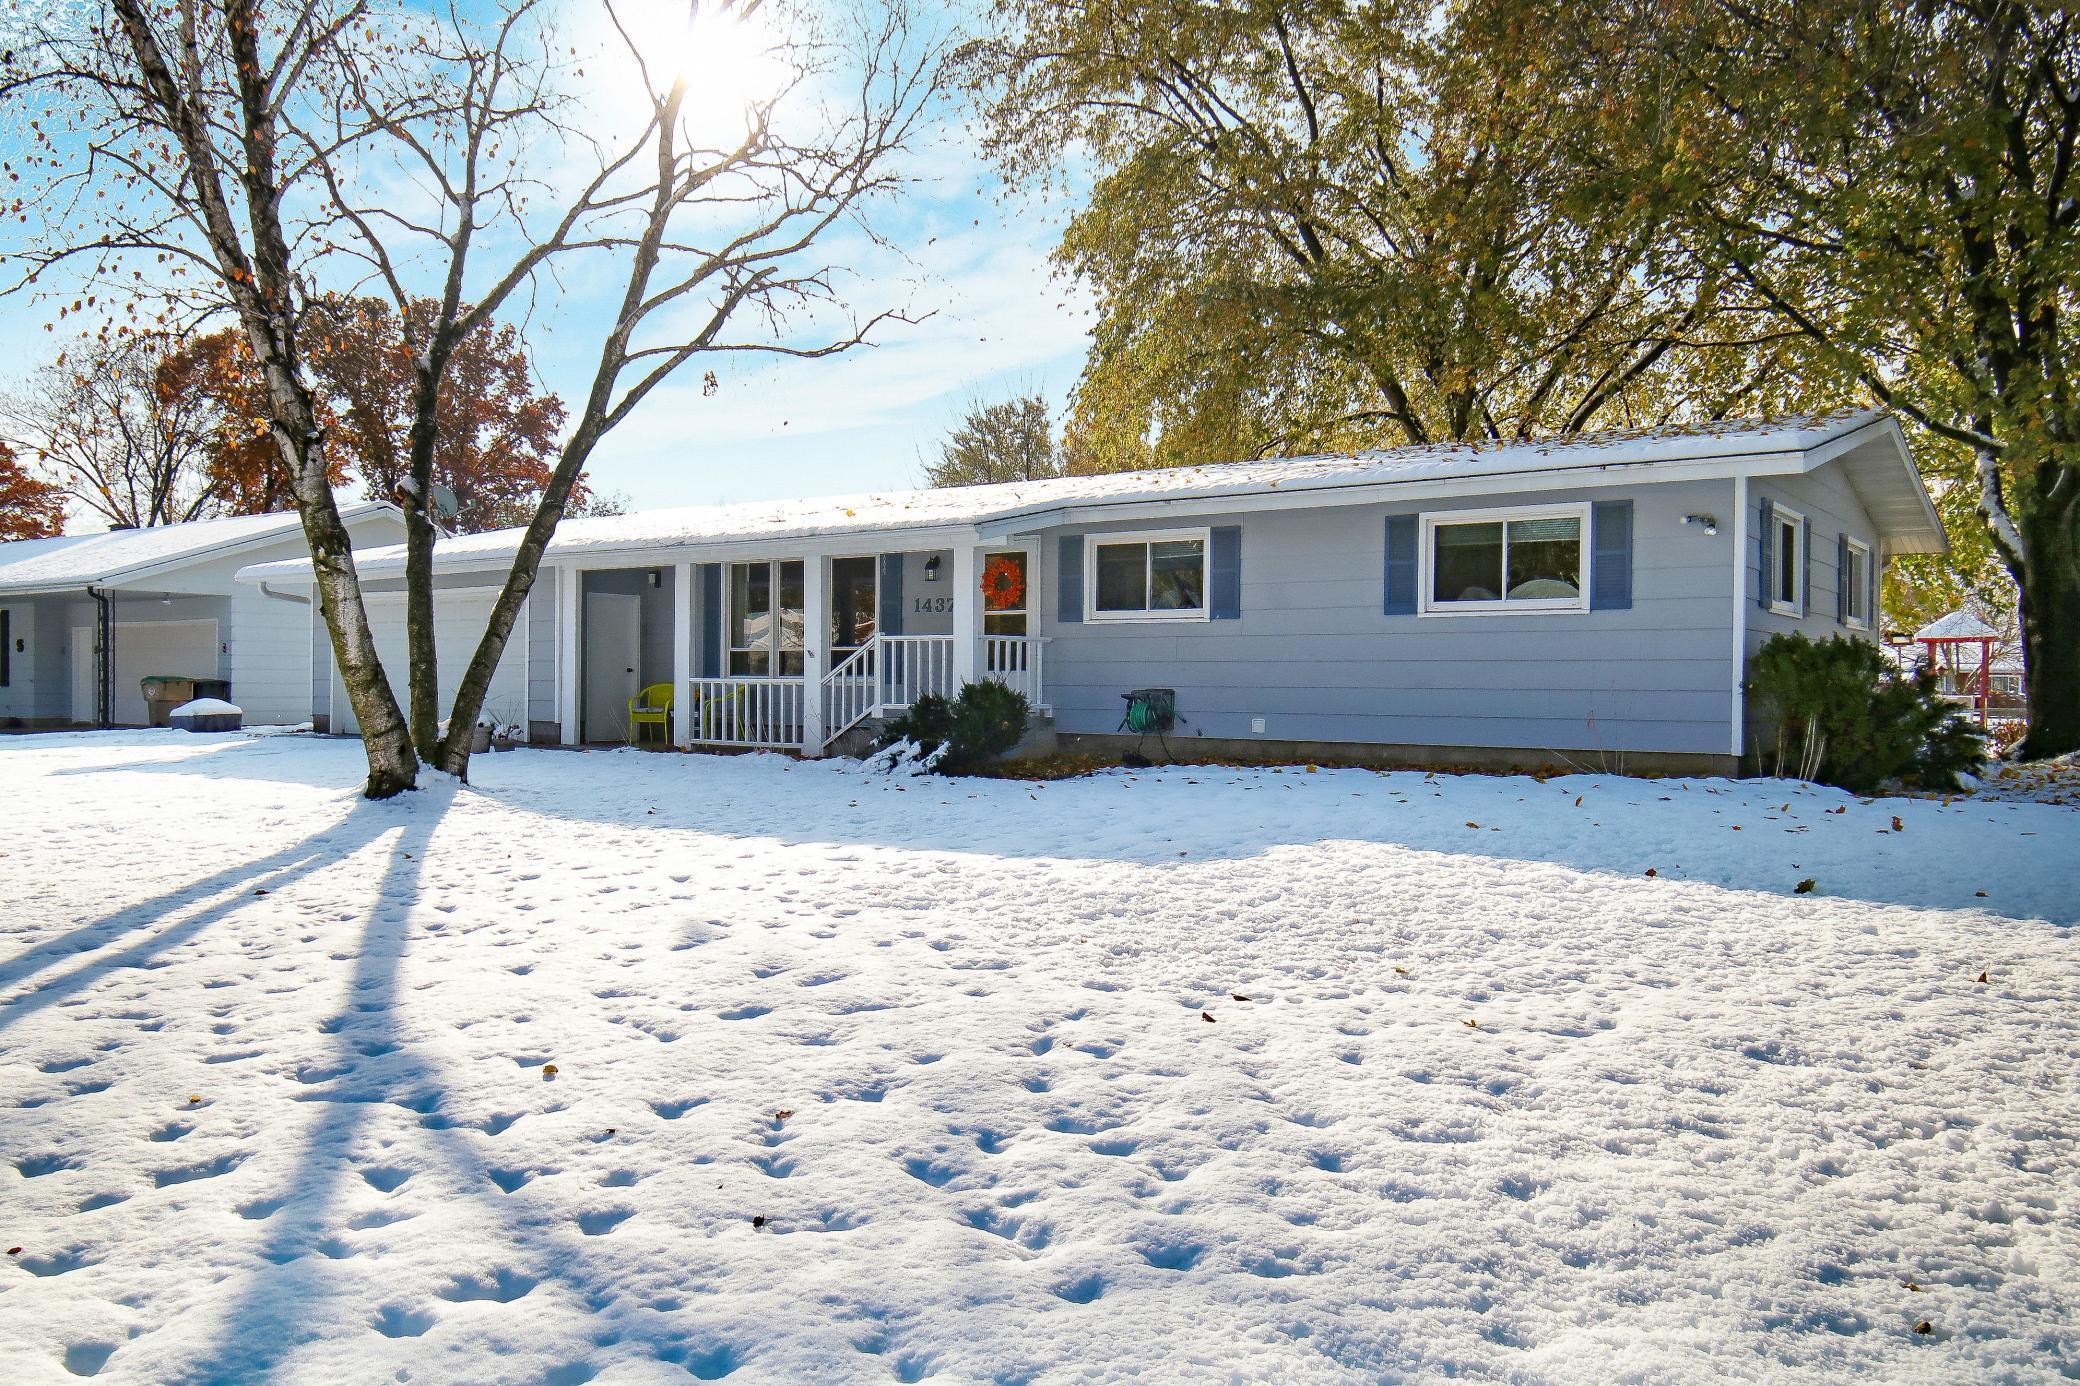 1437 W Willow Street Property Photo - Chippewa Falls, WI real estate listing